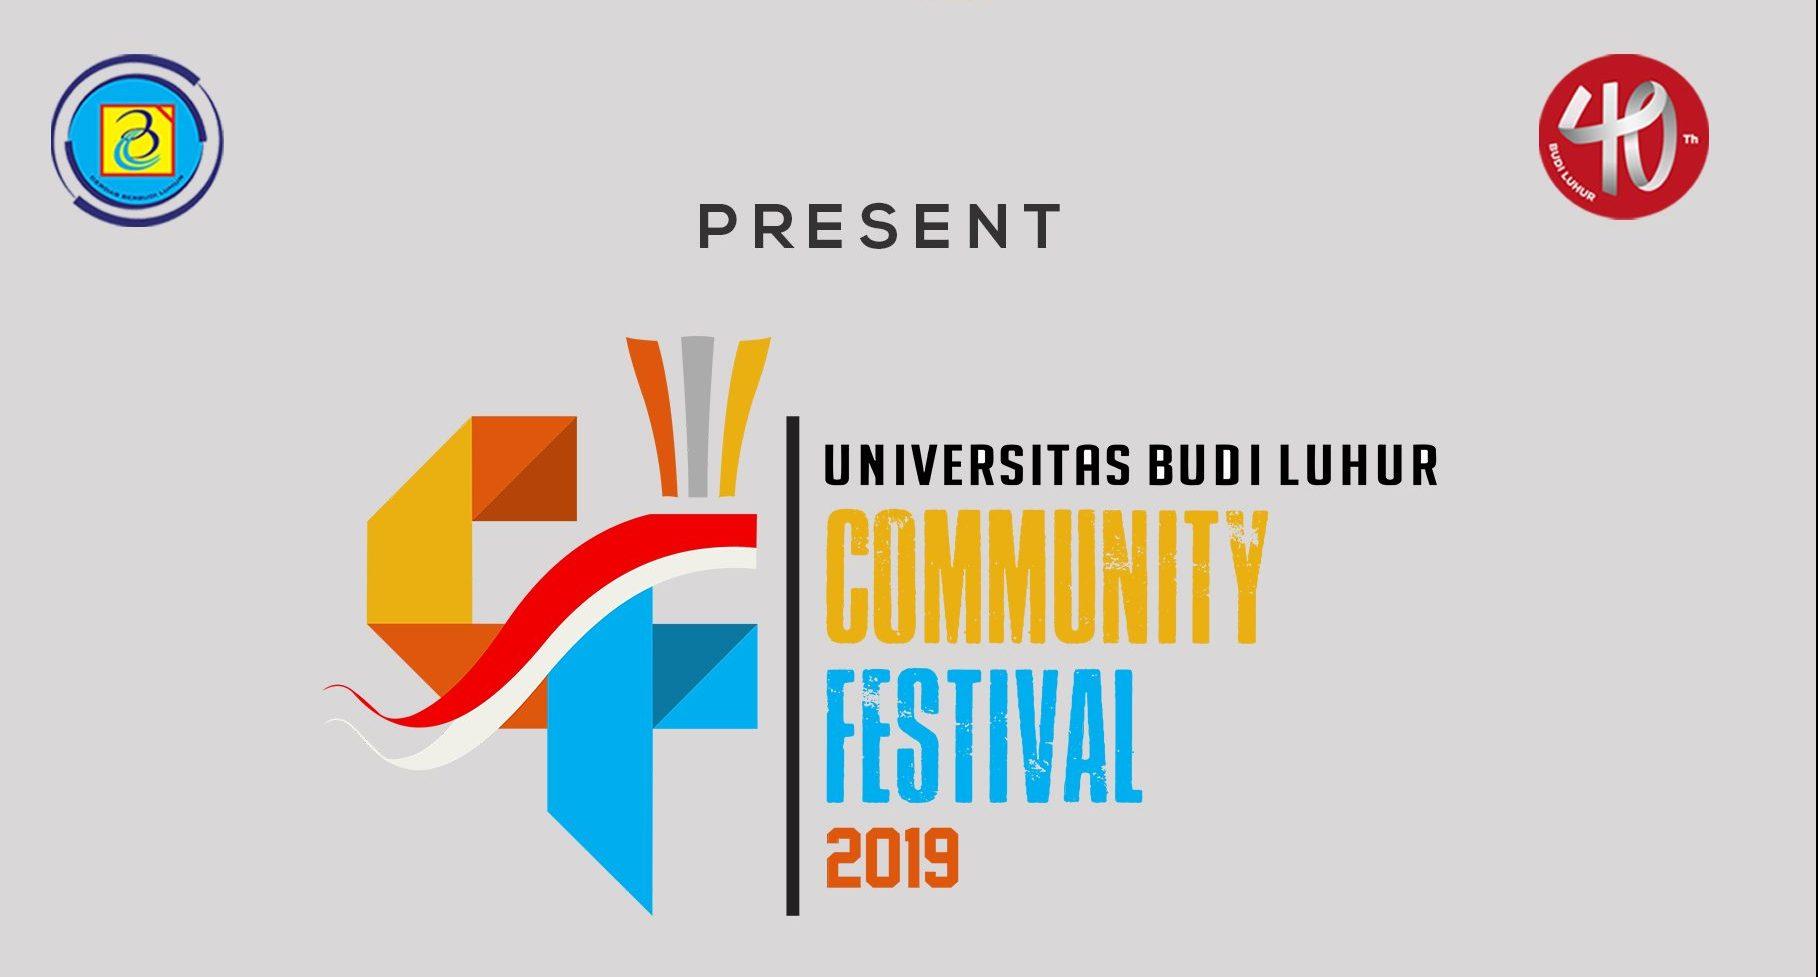 Budi Luhur Community Festival 2019